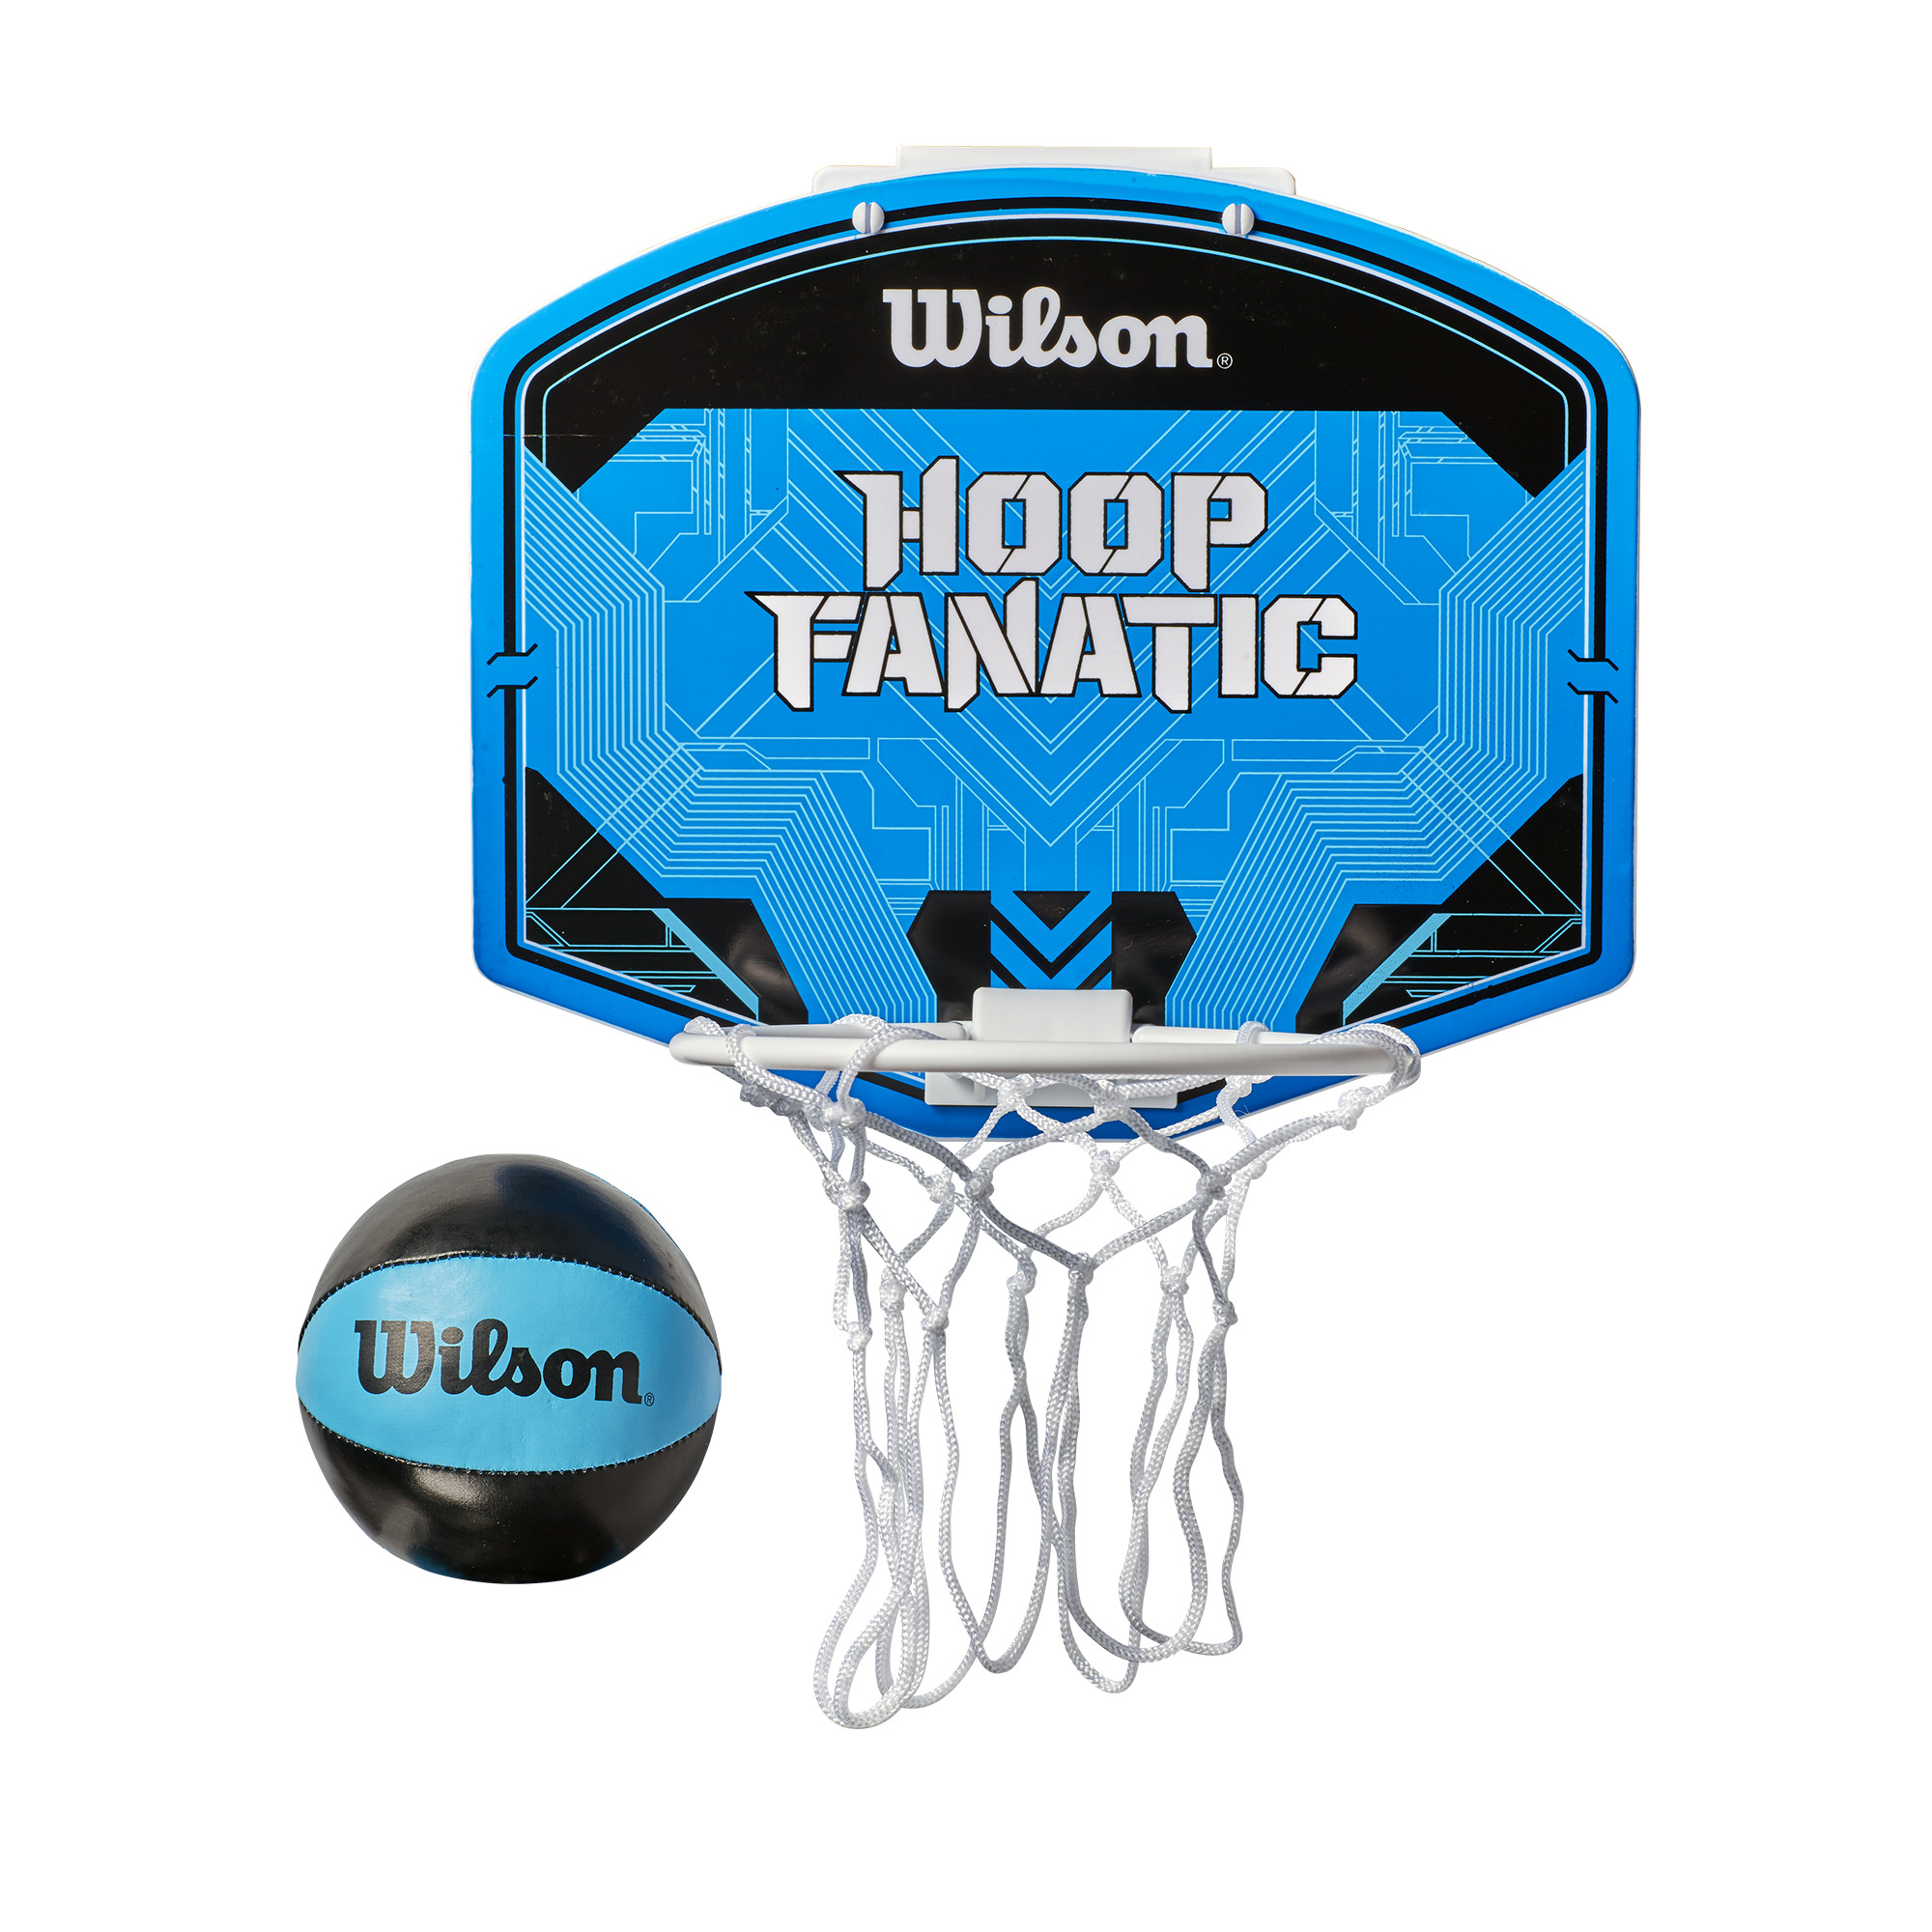 Basketbola komplekts MINI-HOOP FANATIC bumba